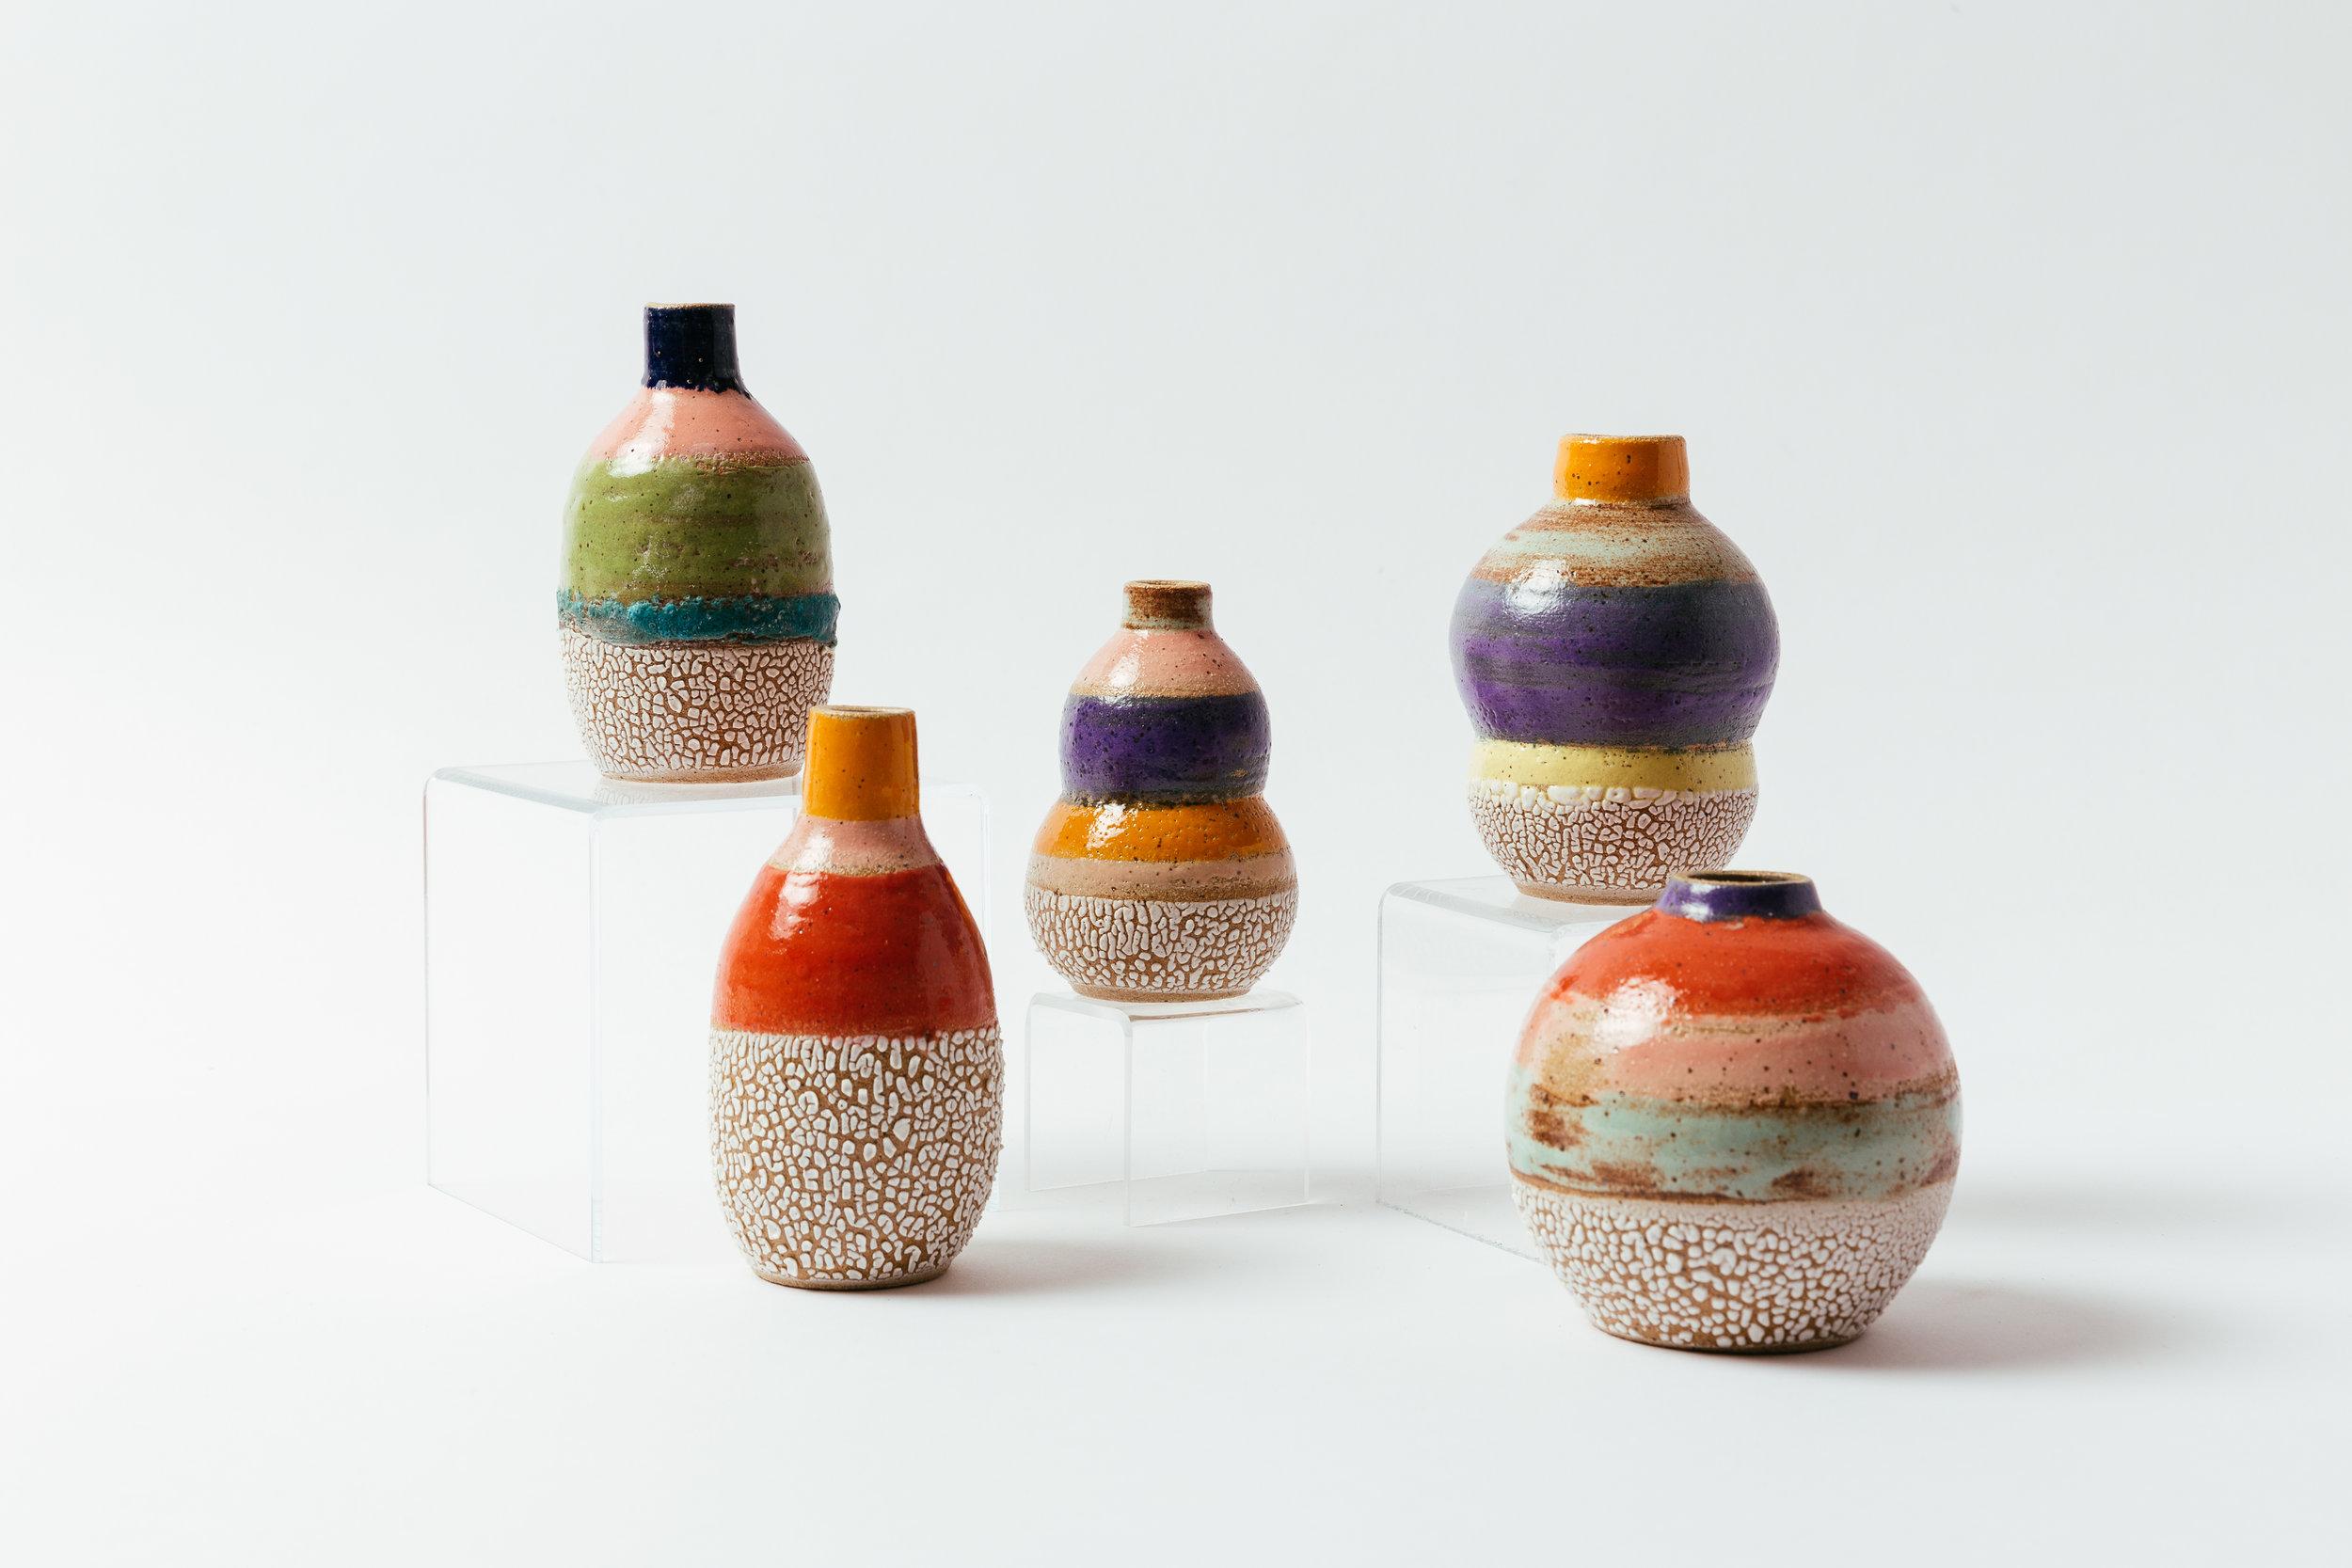 rainalee_ceramics_18_087A1309.jpg